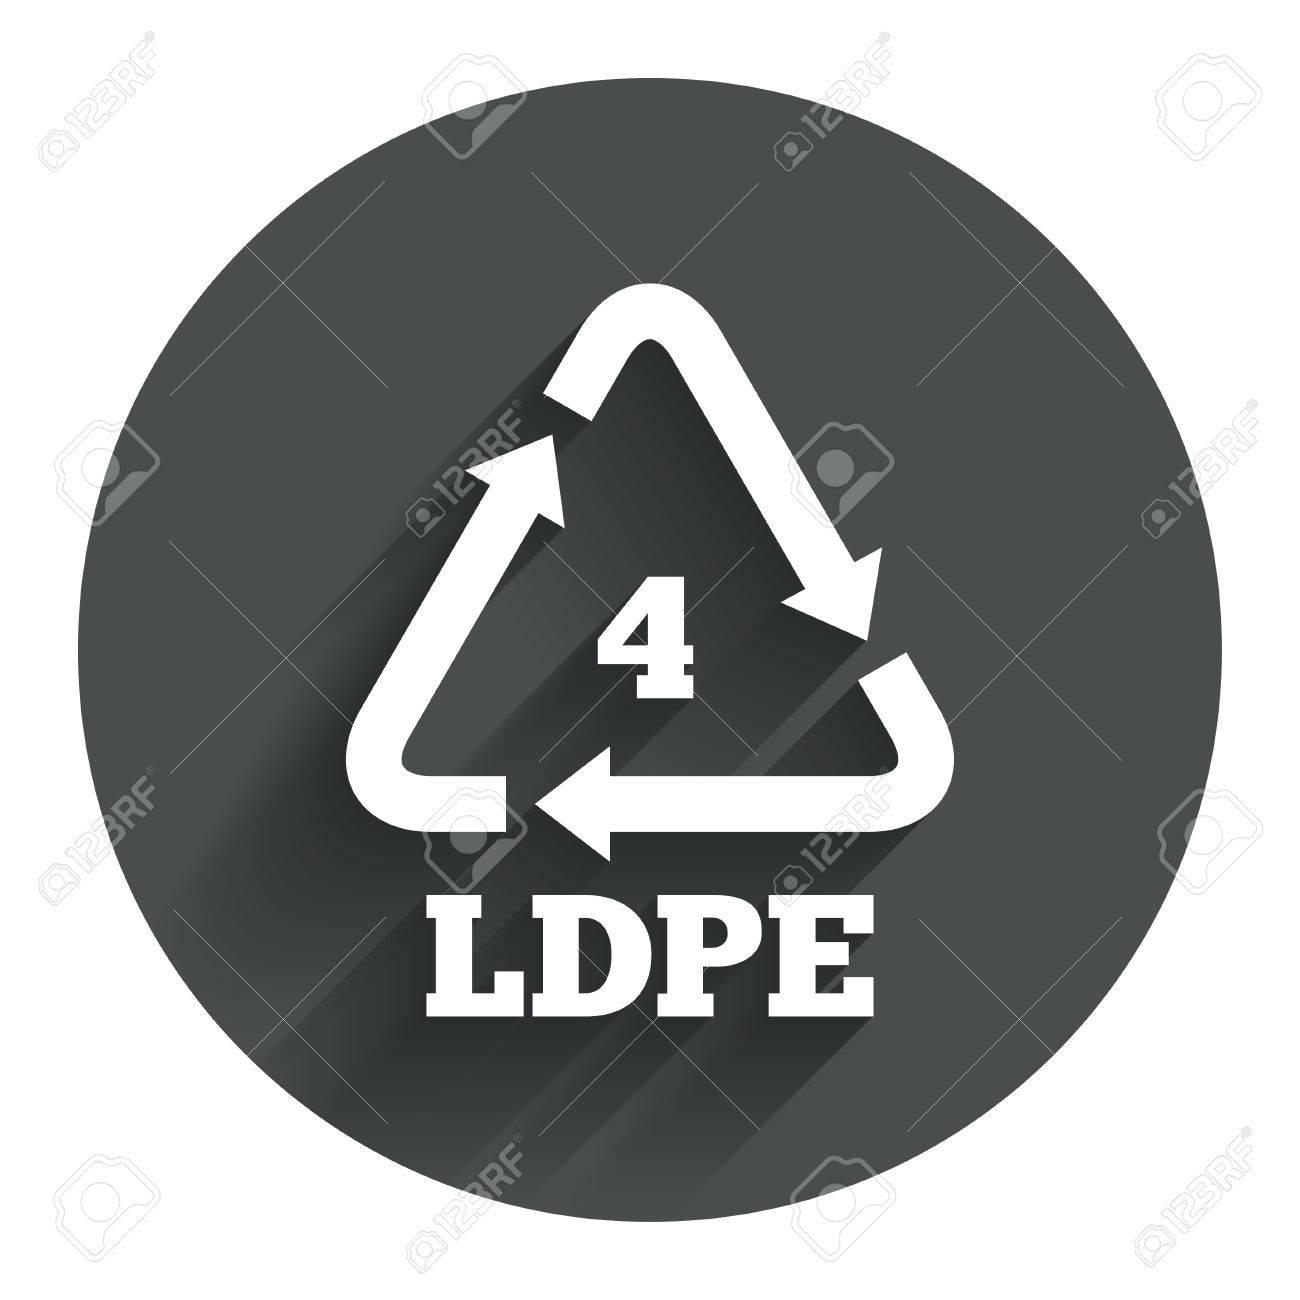 Ld pe 4 icon low density polyethylene sign recycling symbol ld pe 4 icon low density polyethylene sign recycling symbol circle biocorpaavc Choice Image